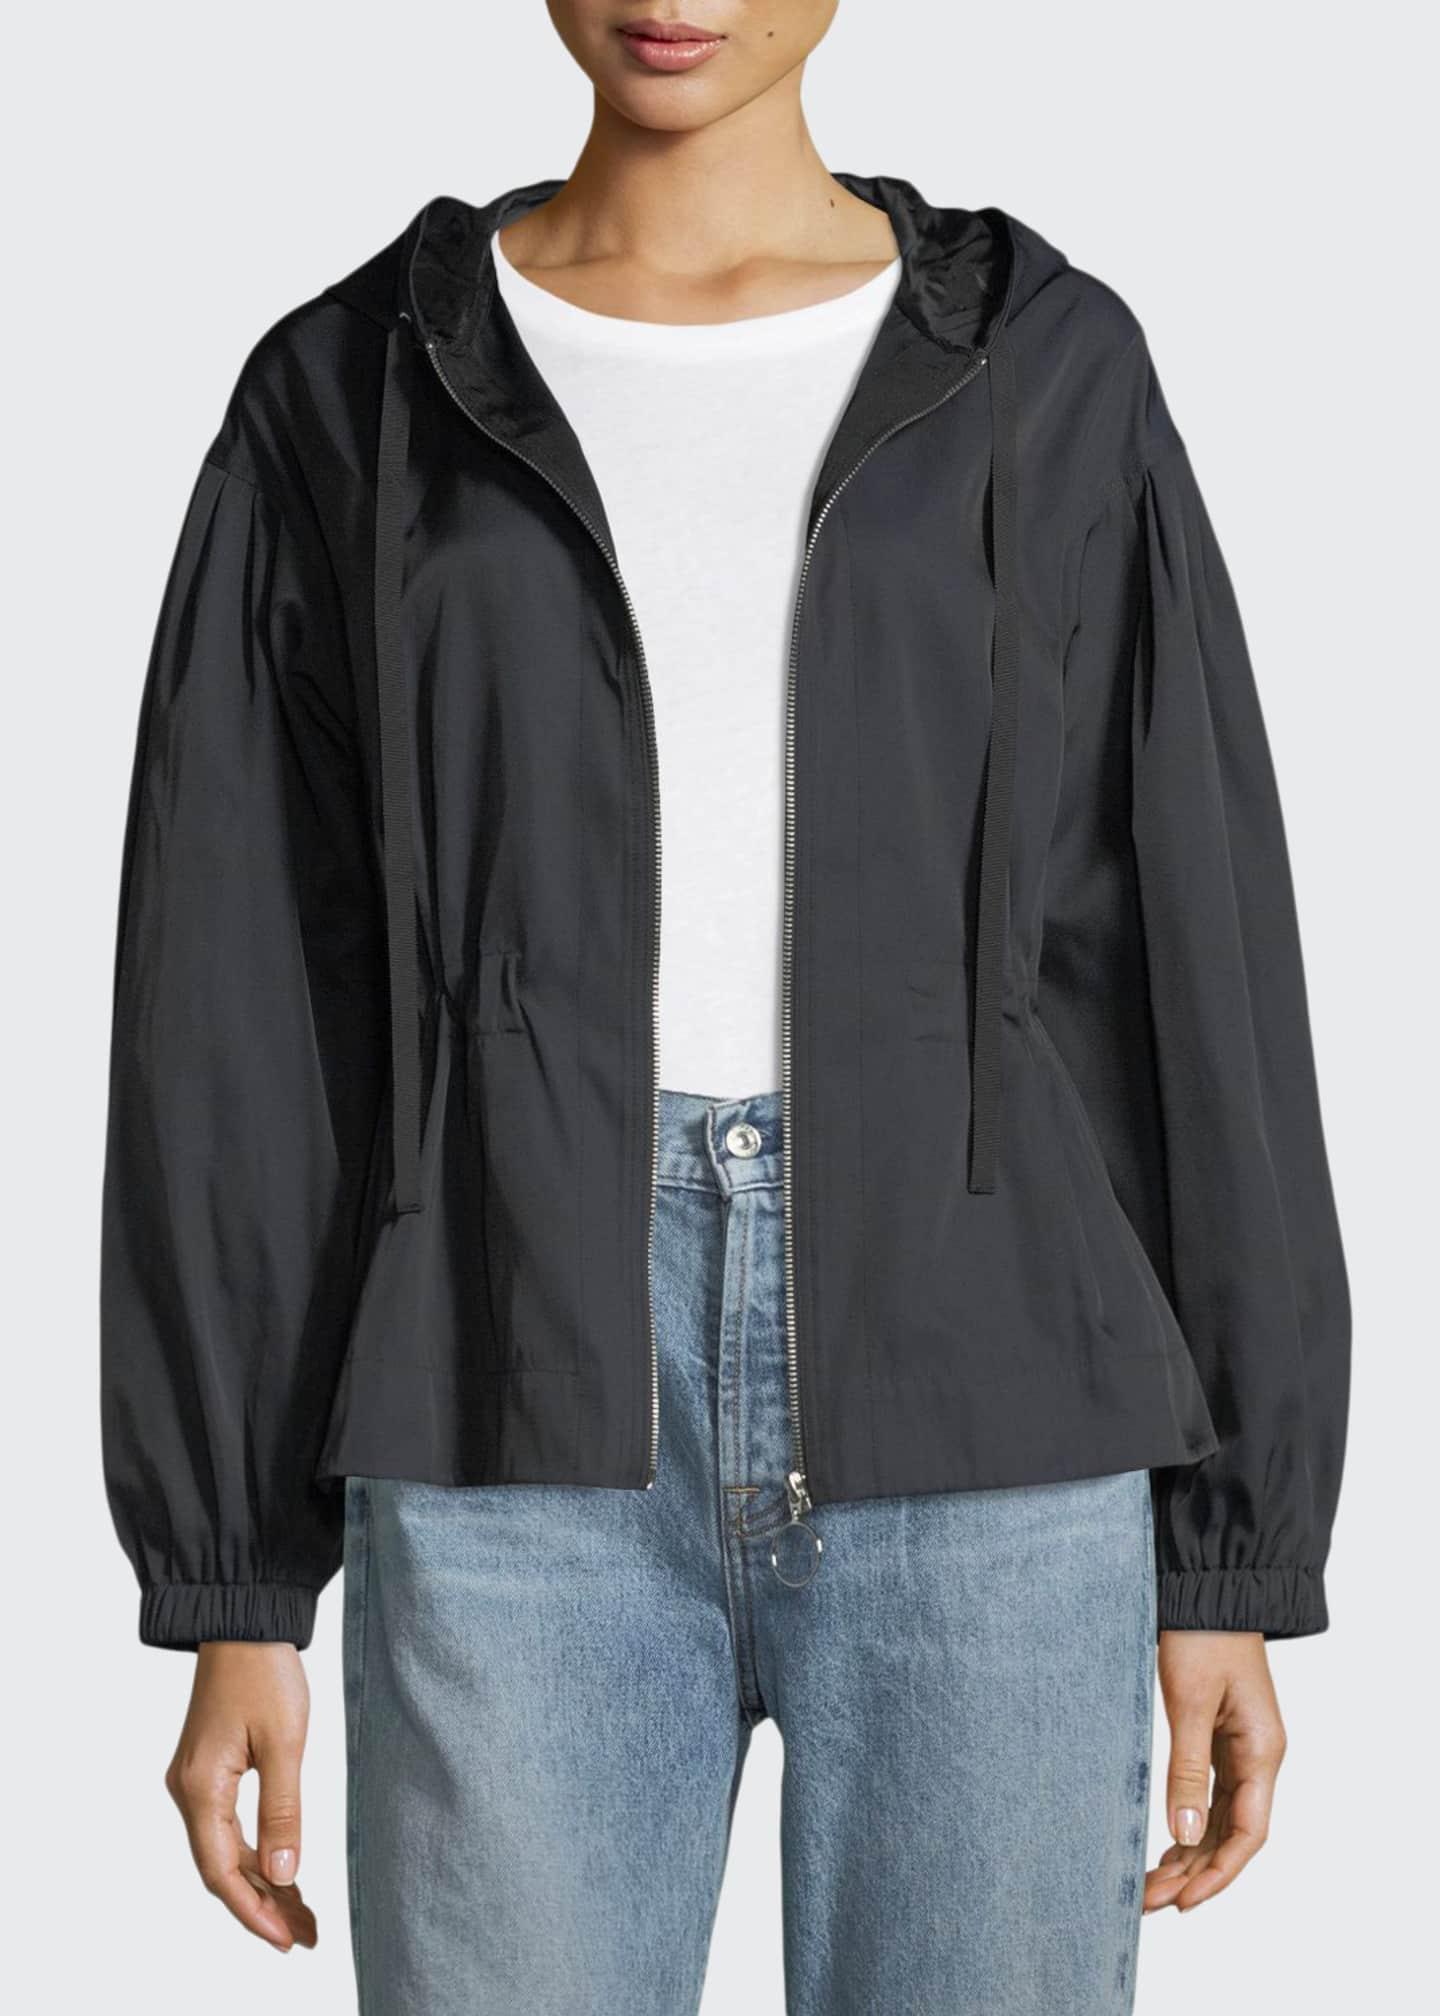 Elizabeth & James Melanie Zip-Front Cinched-Waist Short Jackets